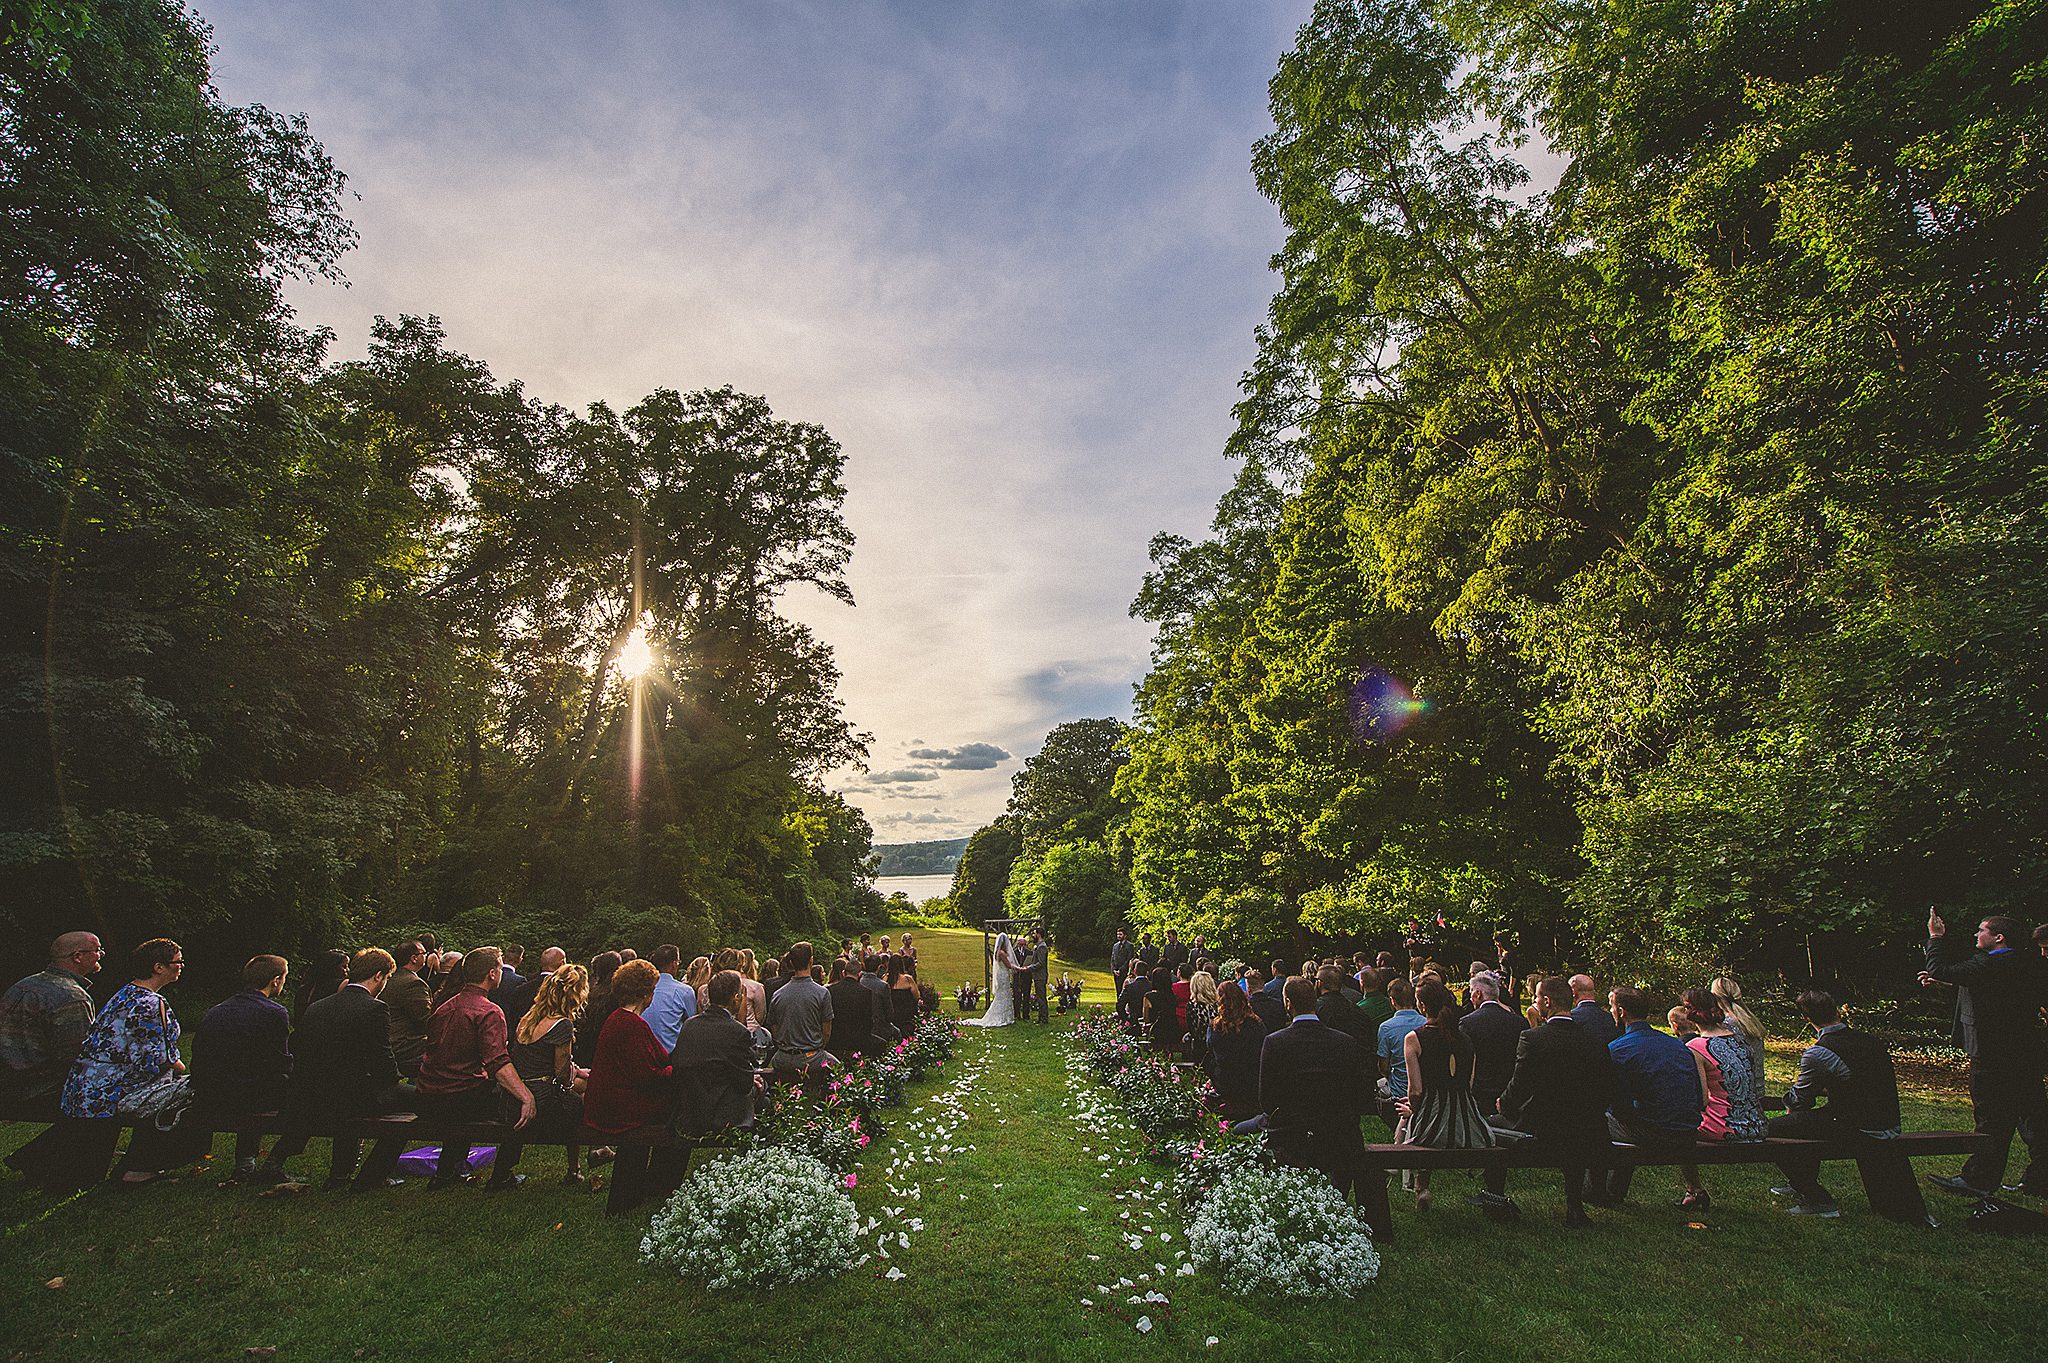 20-mt-gulian-historic-site-weddings copy.jpg